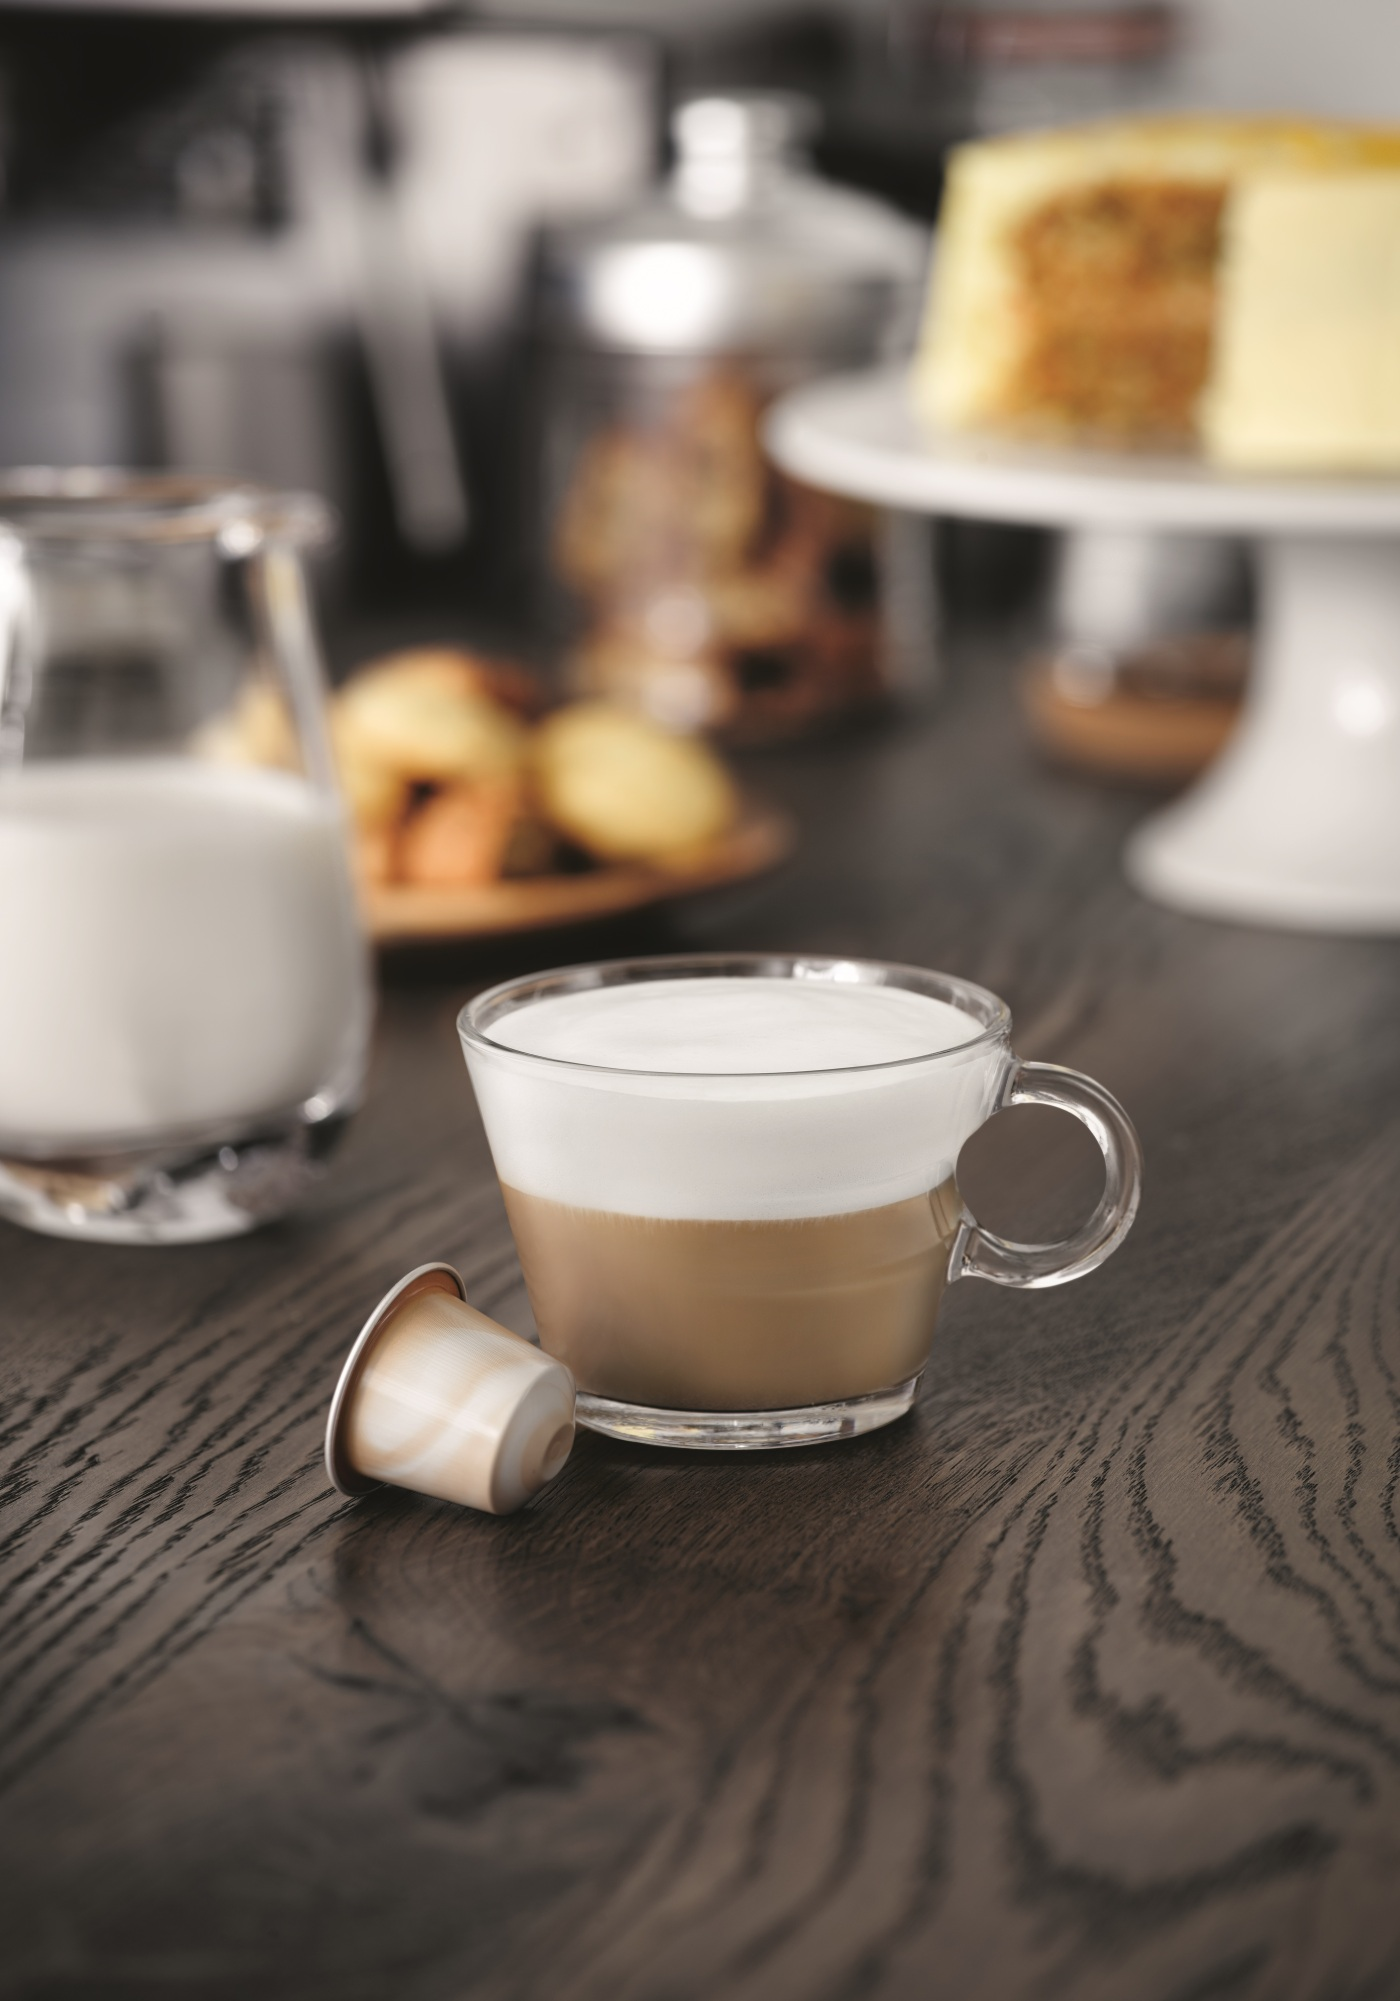 Accueillons Barista de Nespresso, serialfoodie, nespresso, nouveaux crus